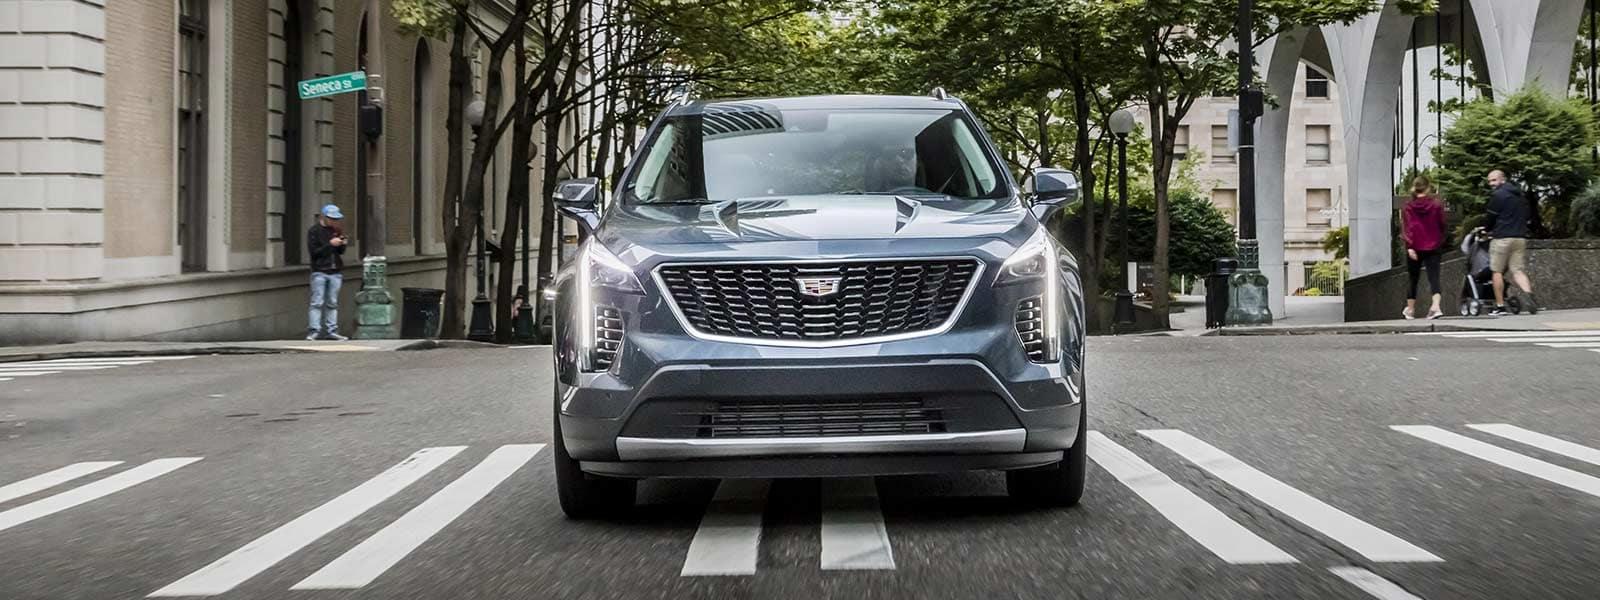 Buy New 2021 Cadillac XT4 in Stanleytown Virginia